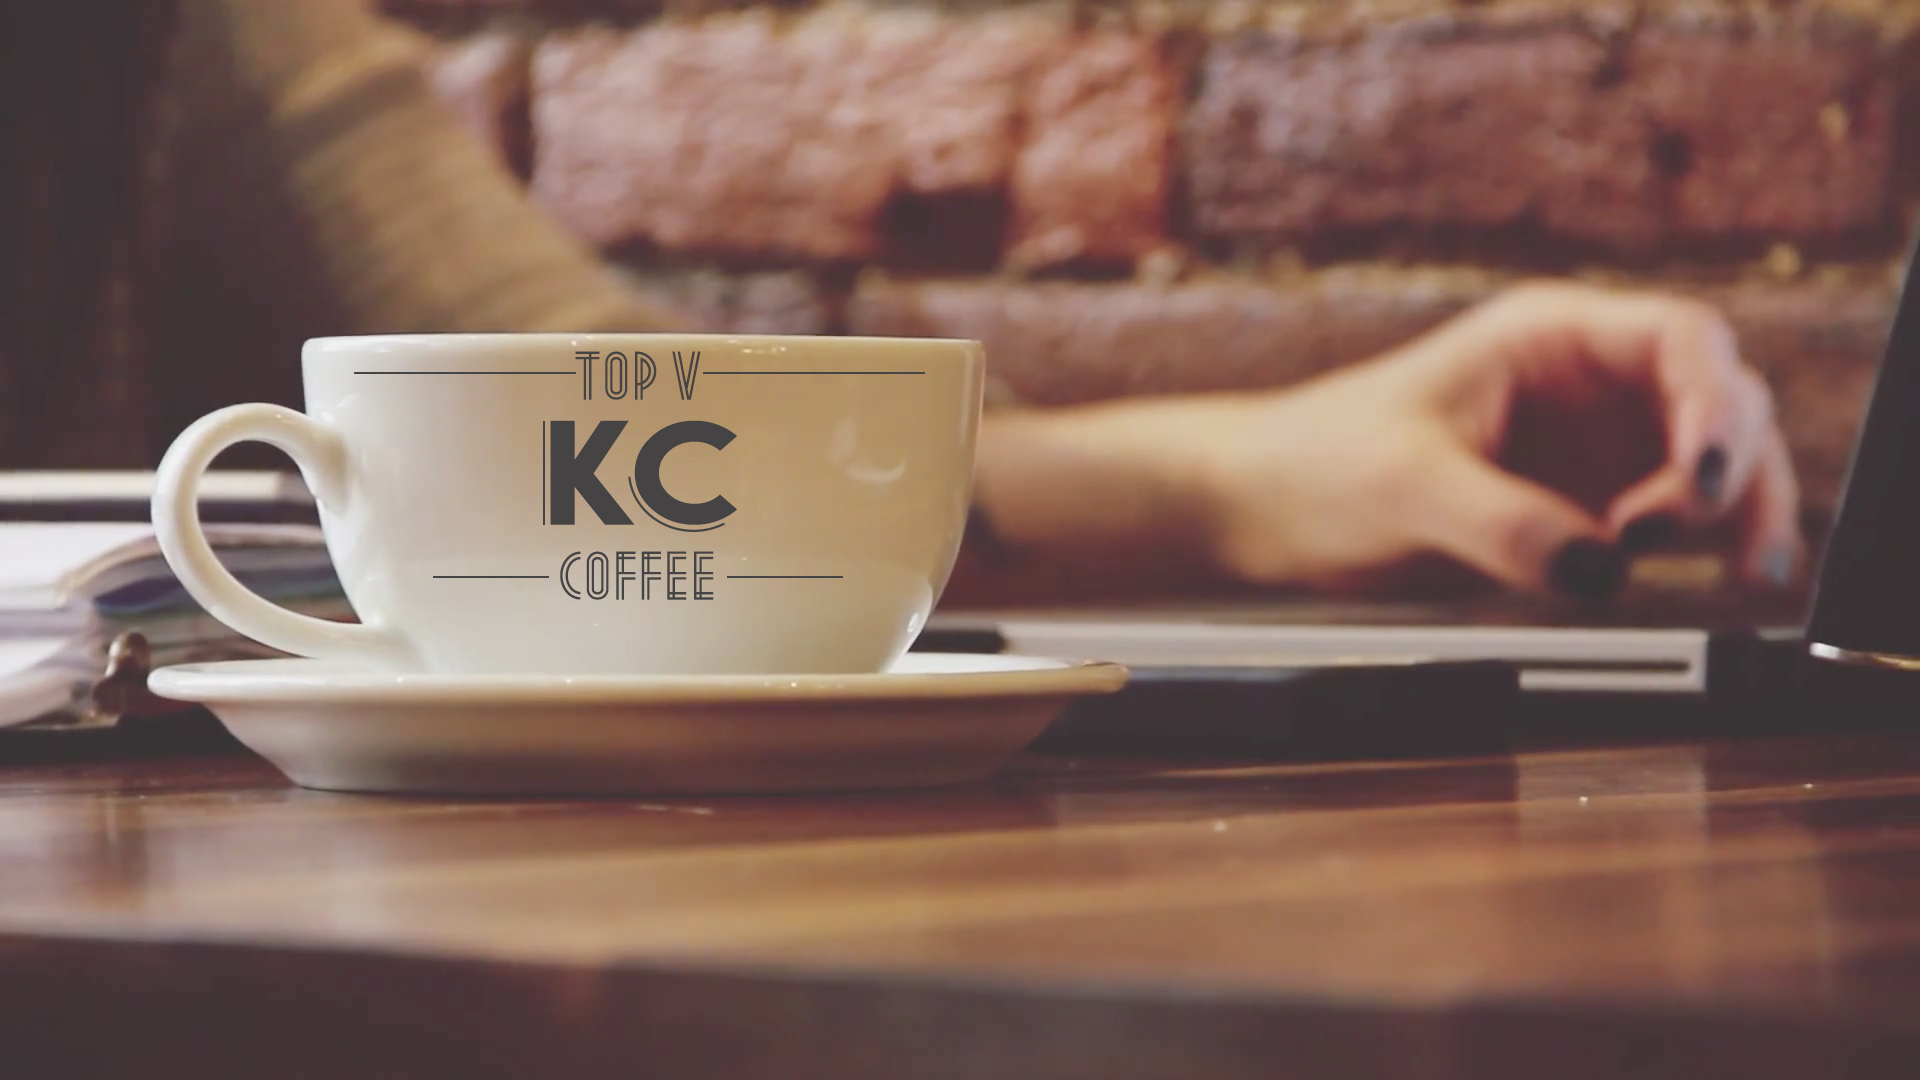 Top 5 Local Kansas City Coffee Shops Kansas City Kansas Attractions Kansas City Missouri